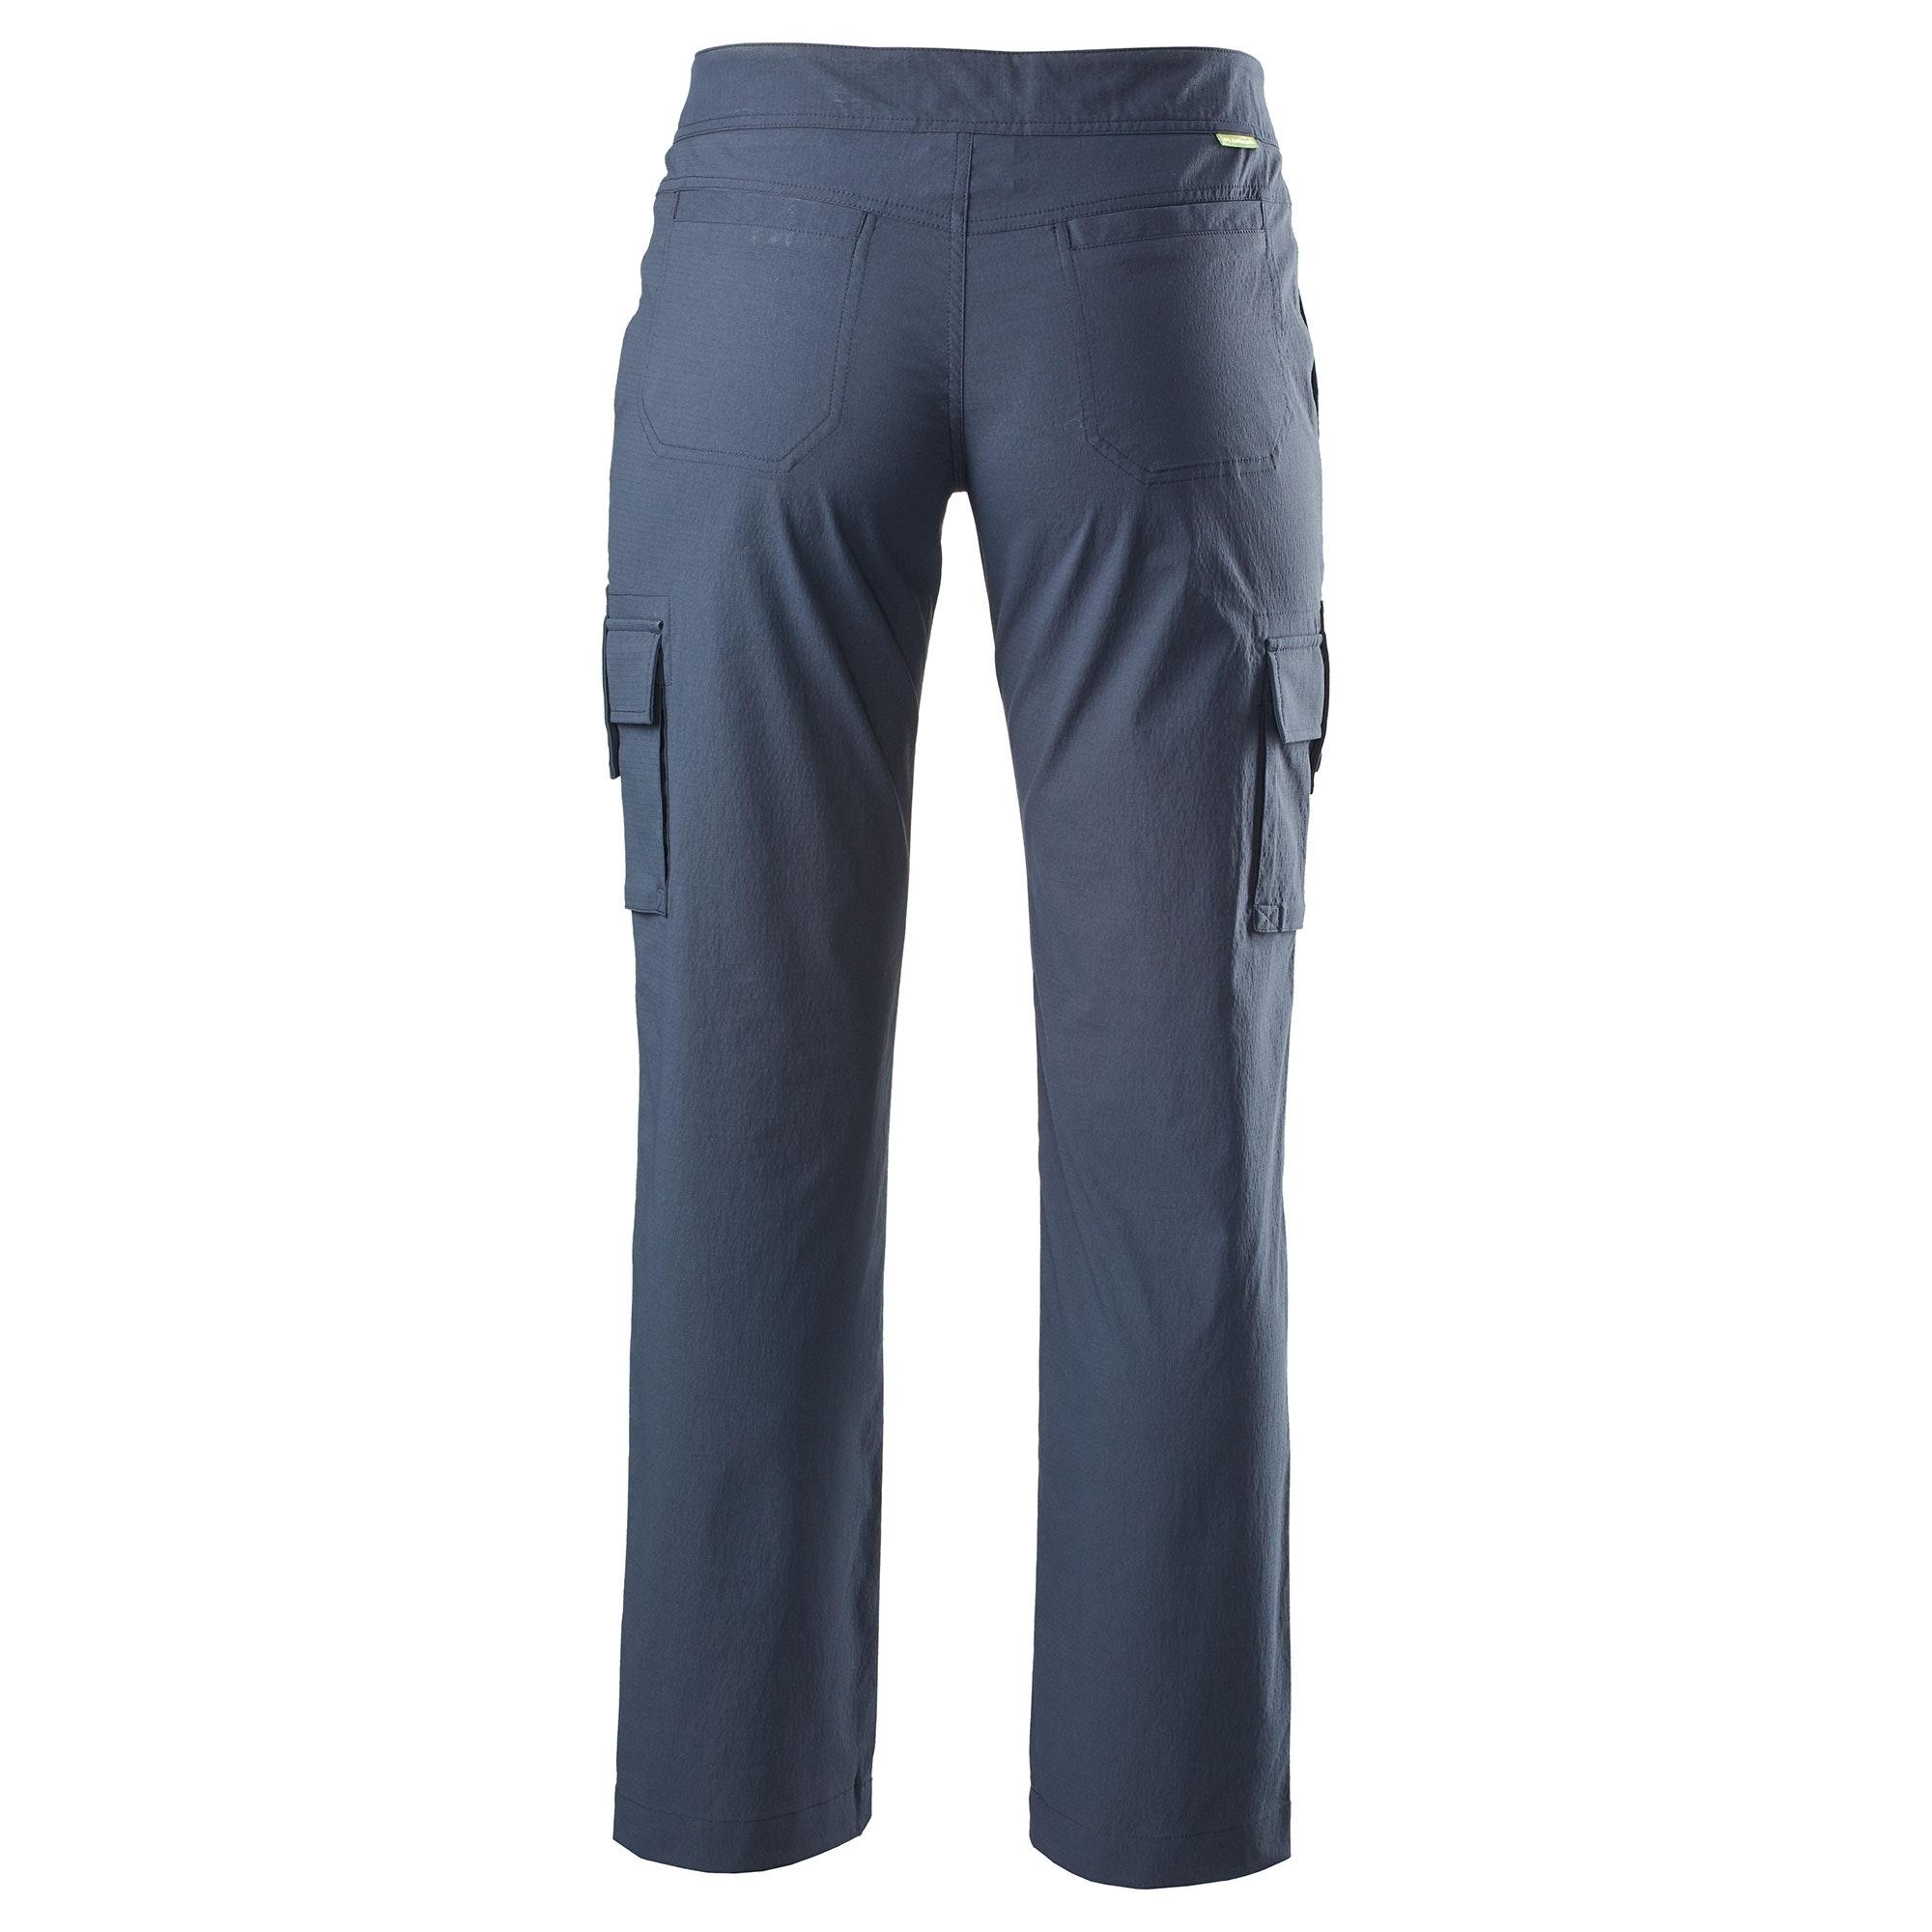 NEW-Kathmandu-Miro-Women-039-s-quickDRY-Pants-Trousers-Stretch-Travel-Cargo-Recycled thumbnail 14